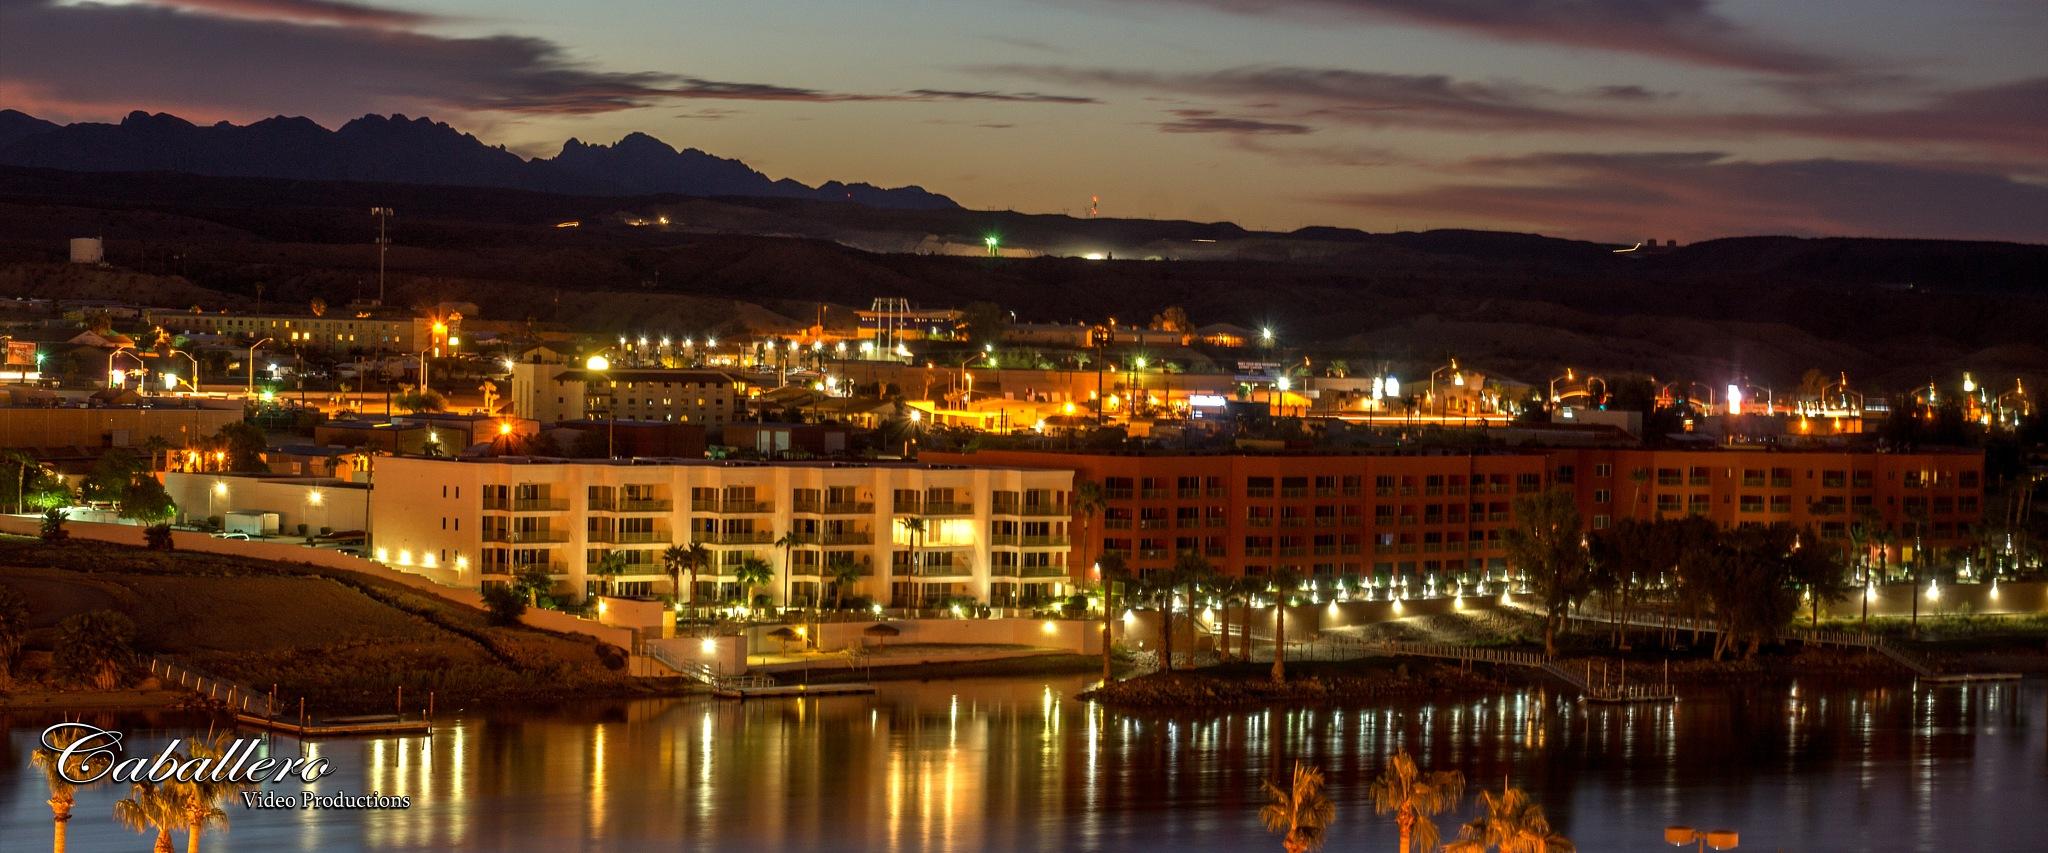 Laughlin, Nevada  by 3caballeros1